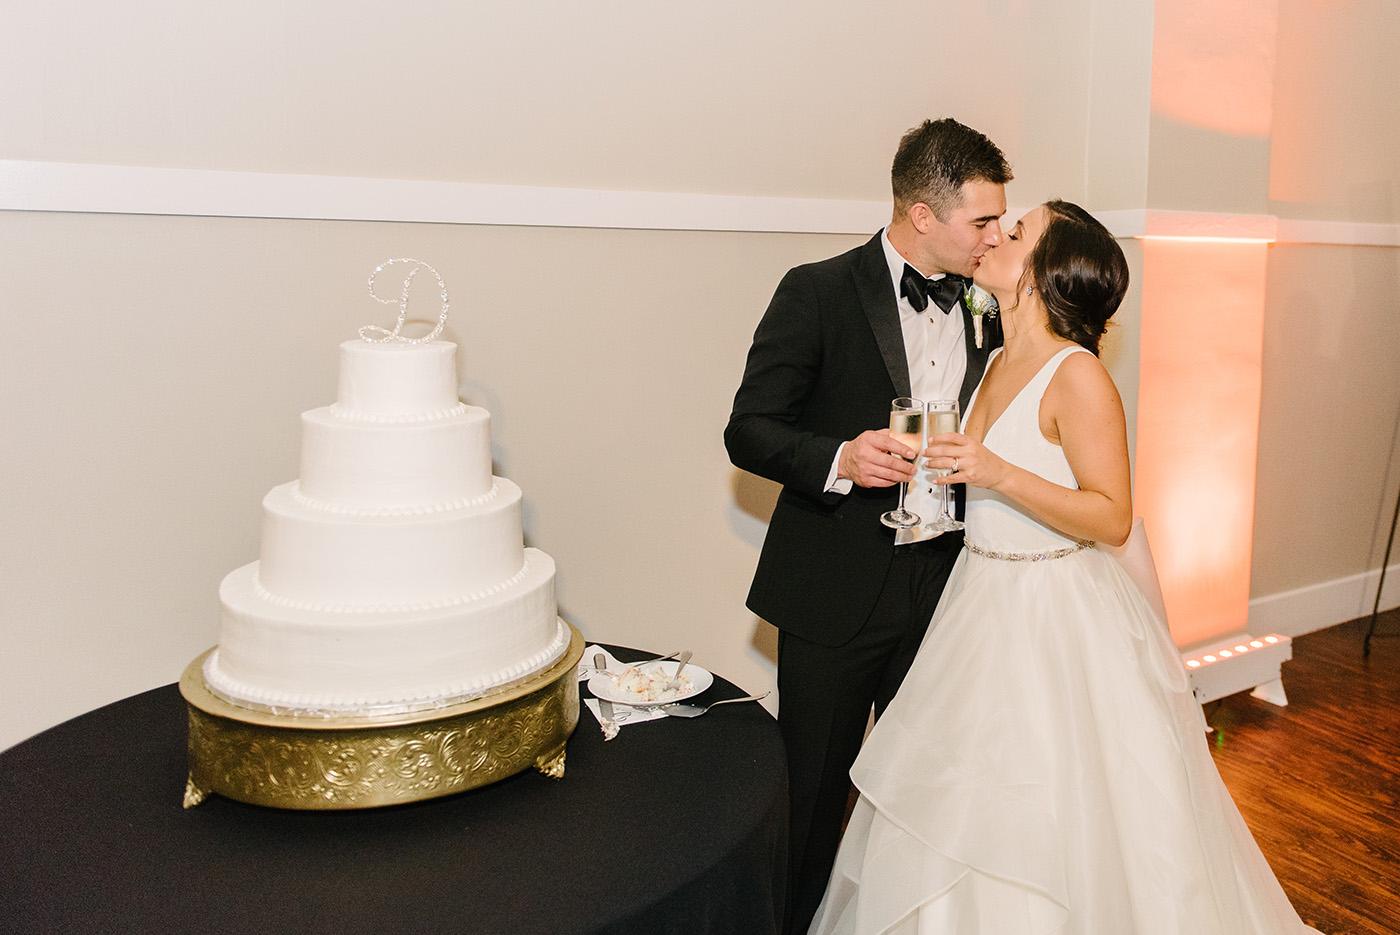 Dallas Wedding Planner - Winter Wedding at The Room on Main - Allday Events - 243.jpg